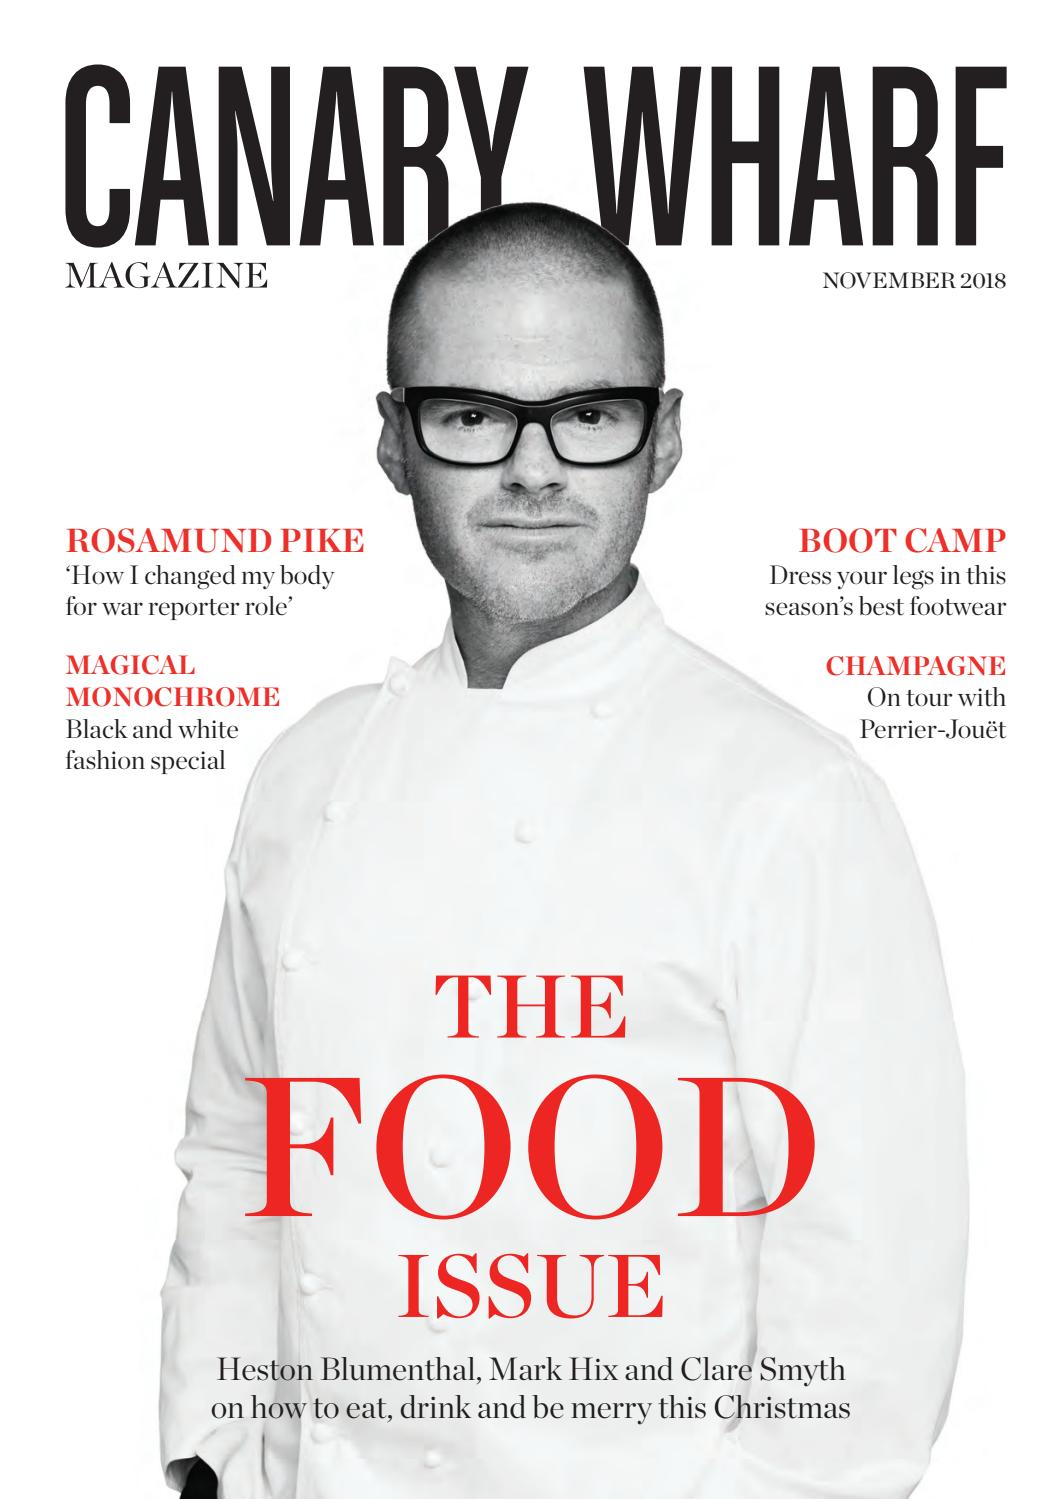 Canary Wharf Magazine November 2018 by Luxury London Media - issuu